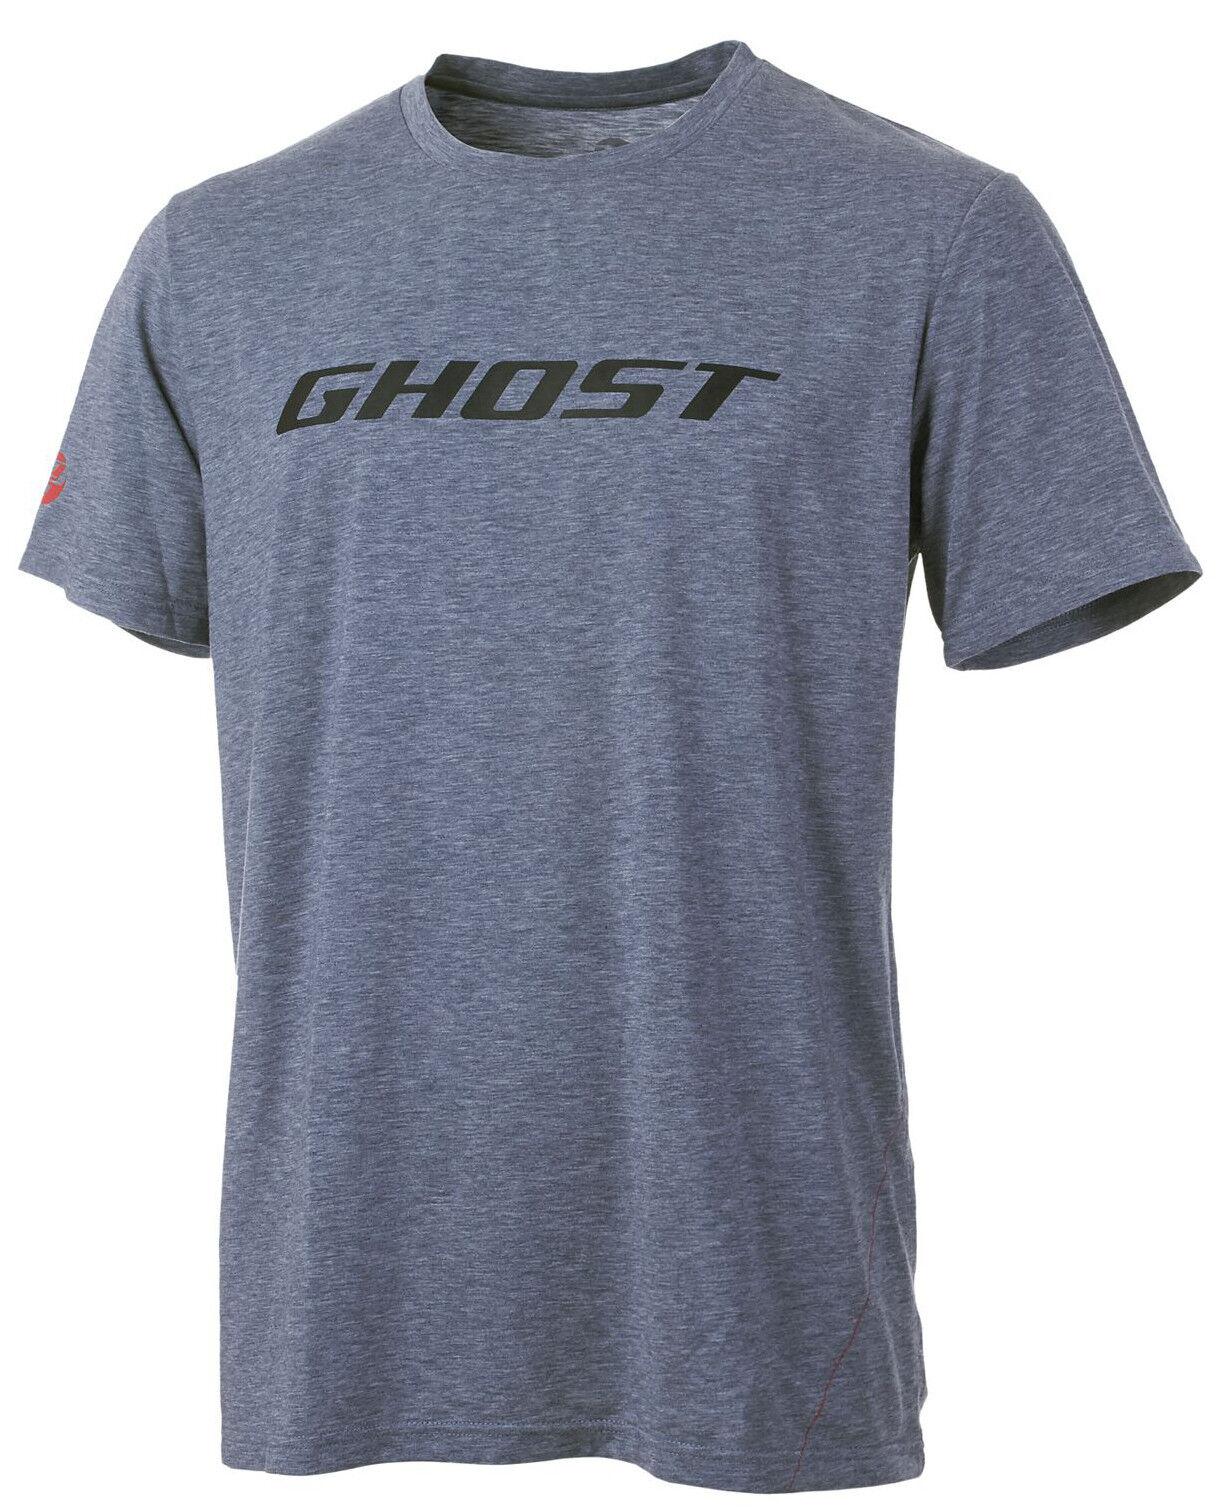 GHOST T-Shirt - Bike Tee Ghost grey black 2017 - S